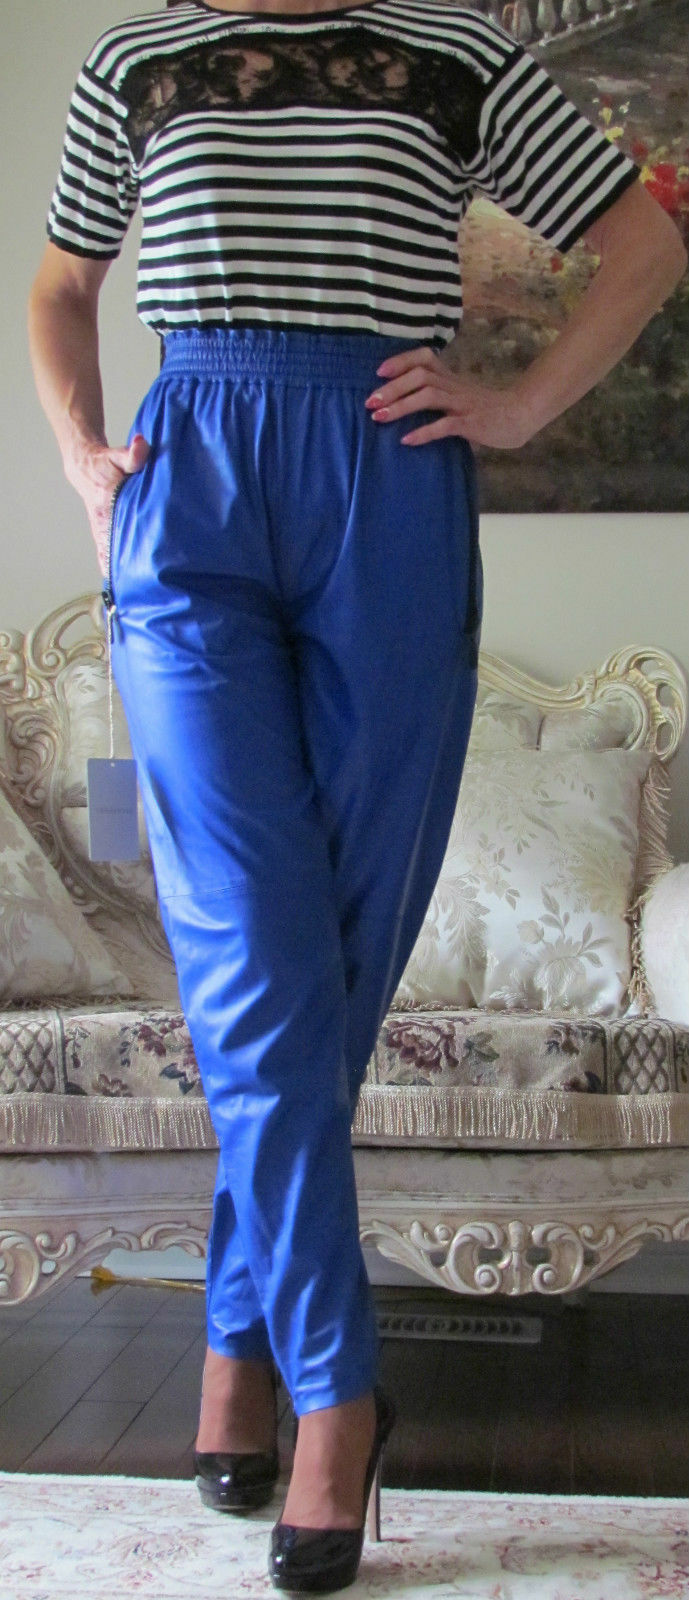 Rare EMILIO PUCCI Runway Calfskin Leather dress-y pants IT 40,US 4-6,S-M